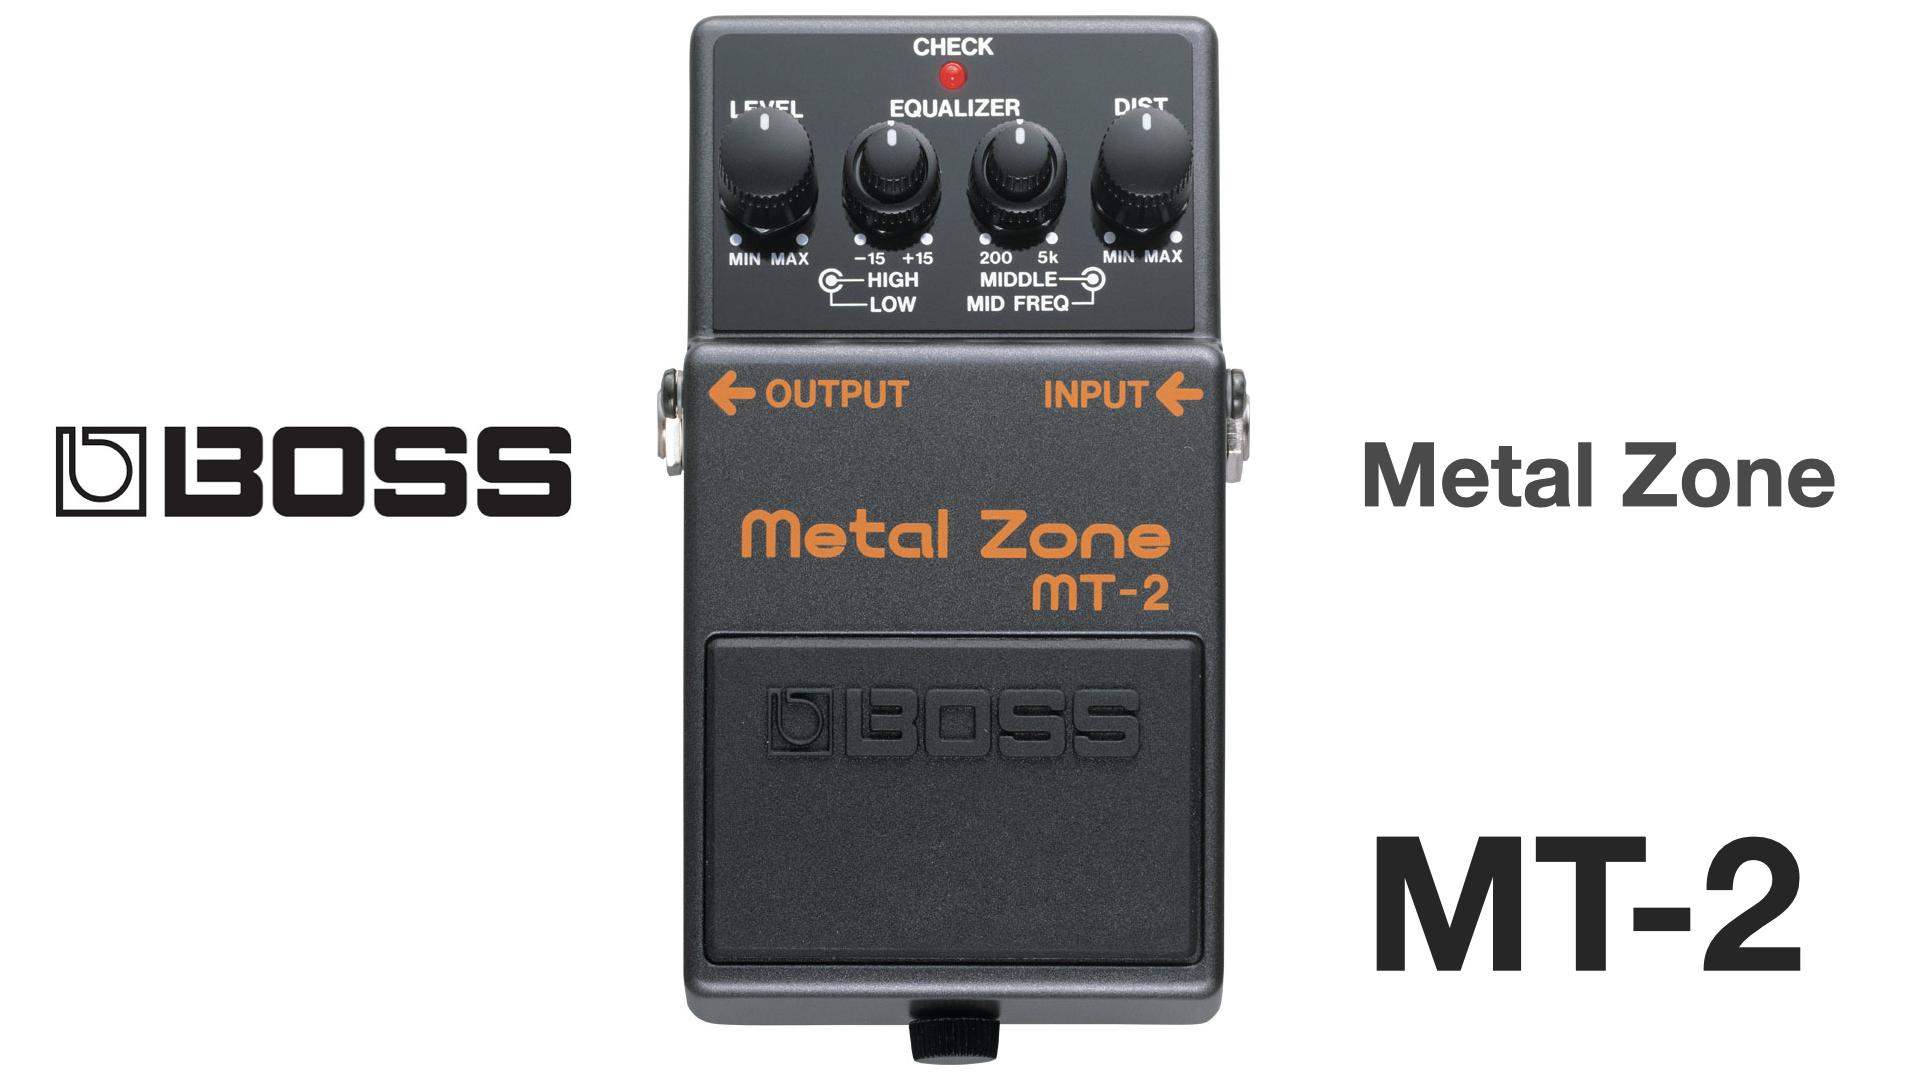 BOSS Metal Zoneの使い方と合う音楽【MT-2、MT-2W】